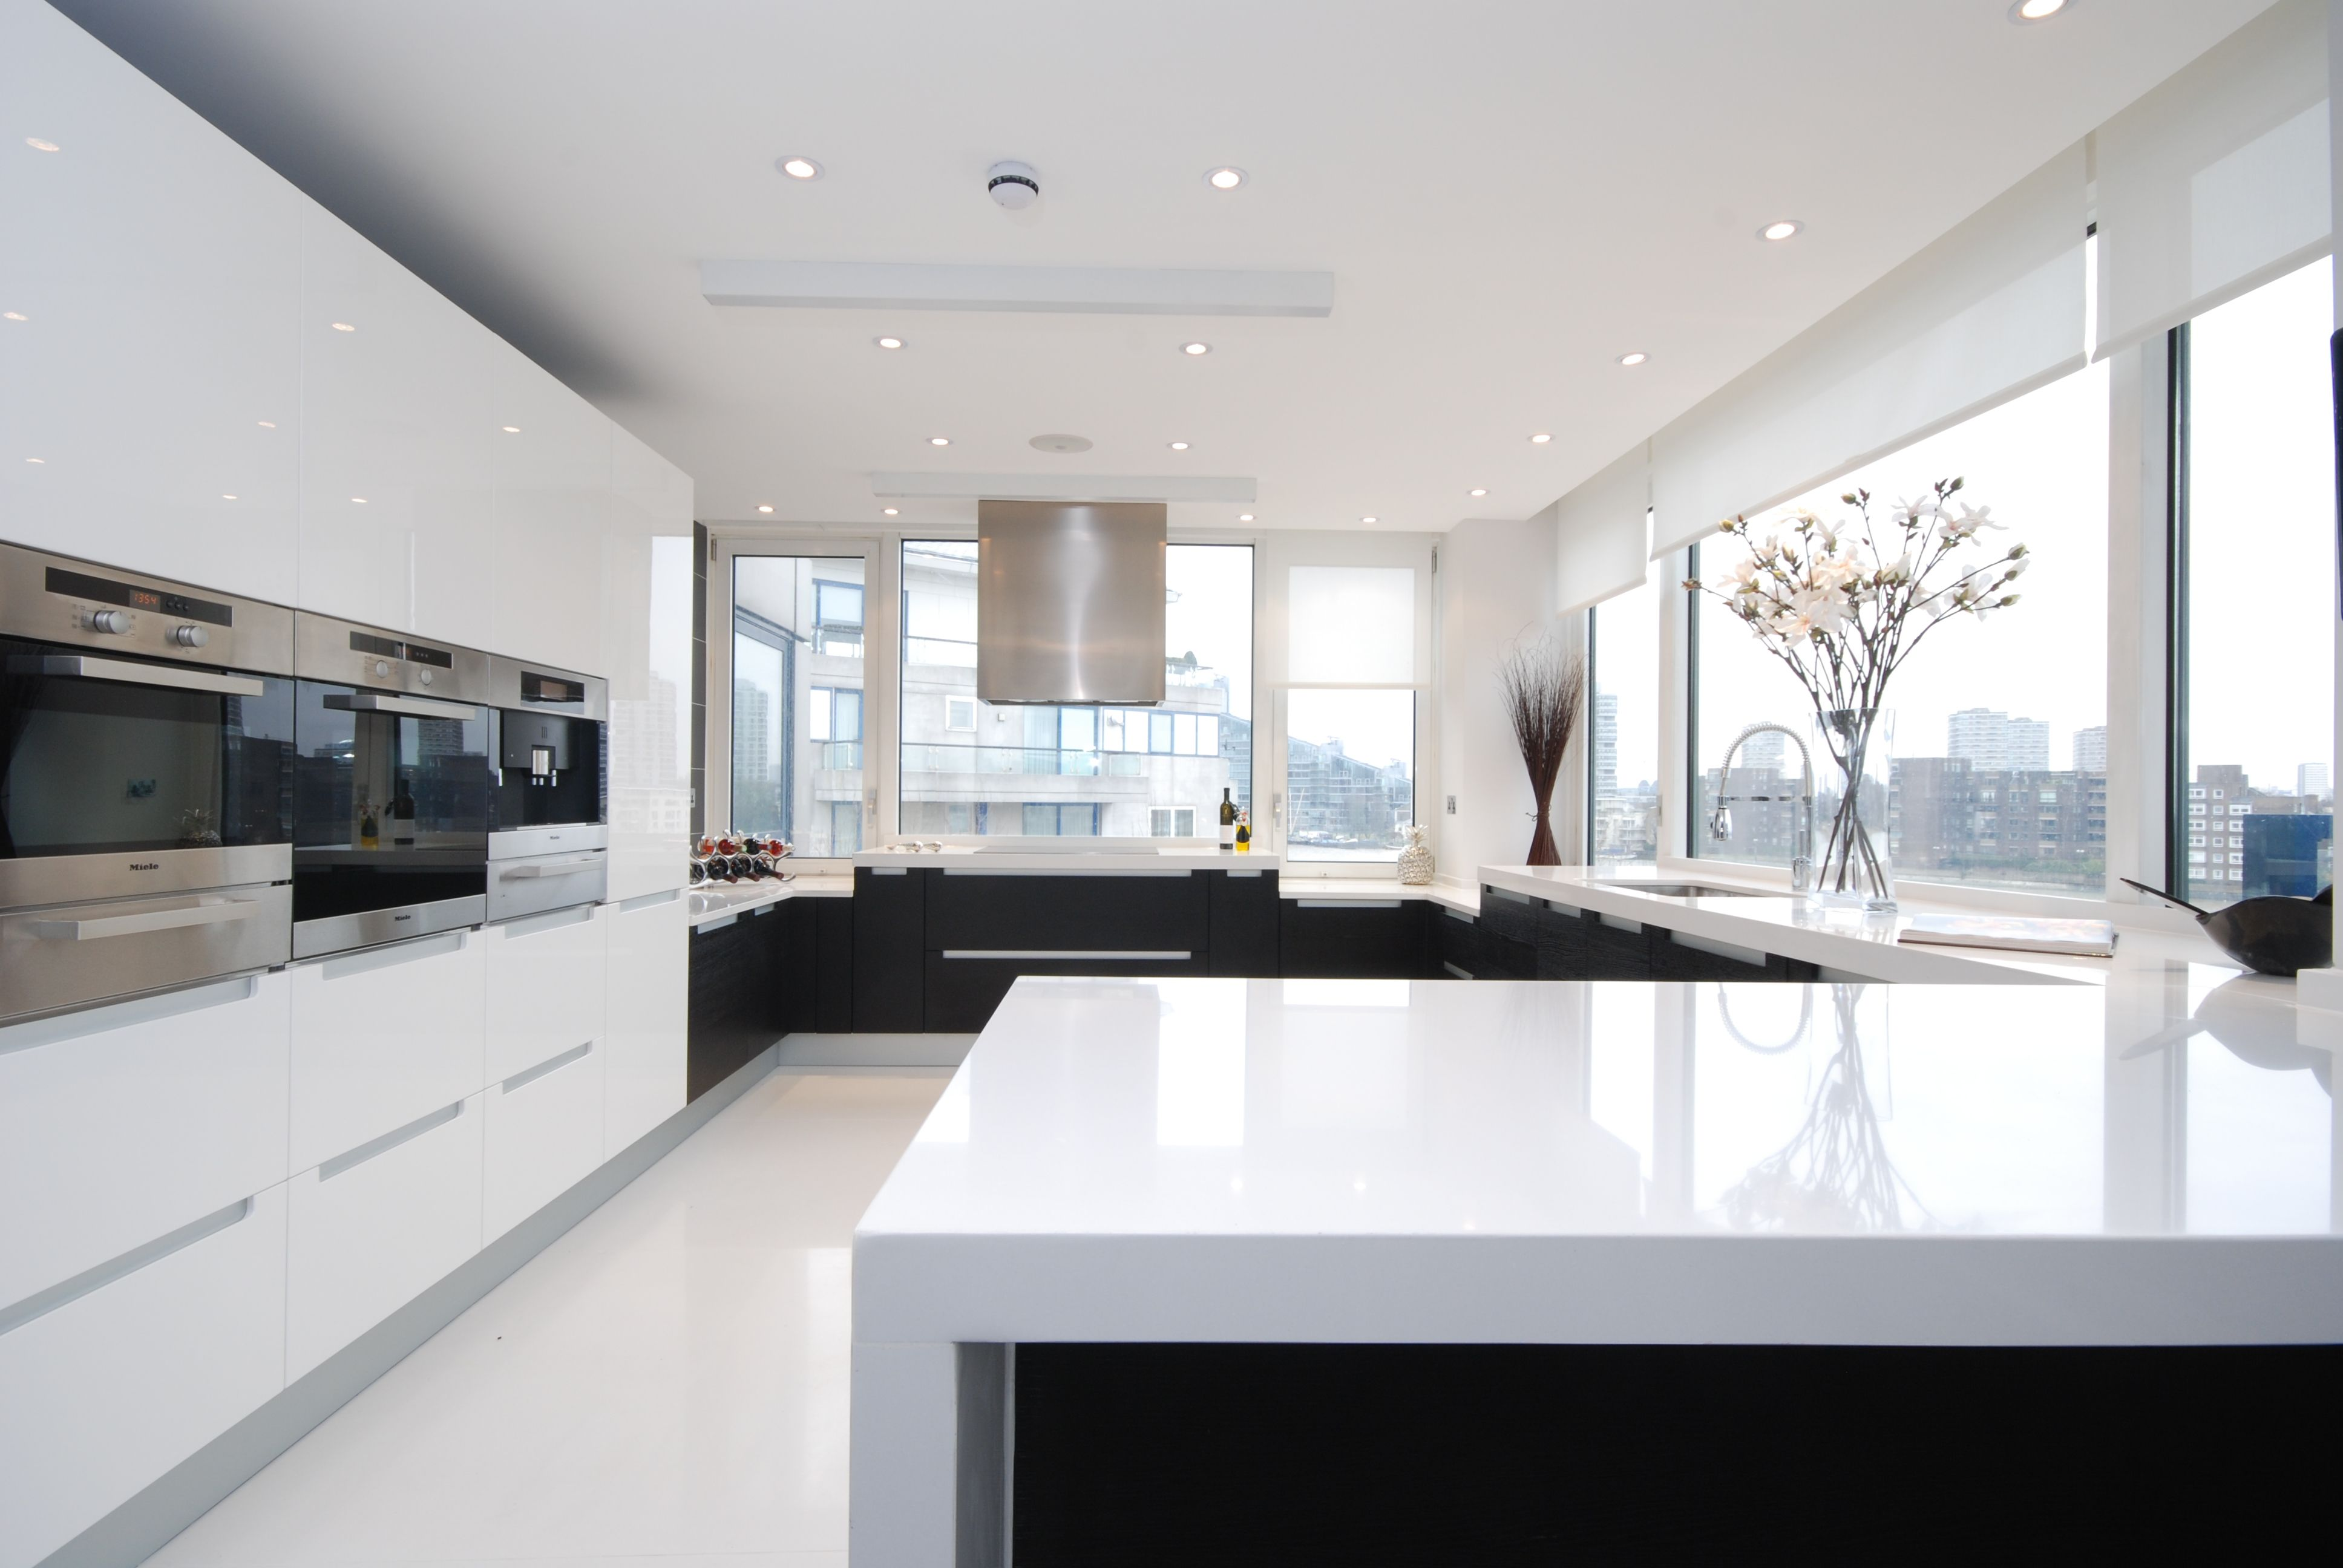 White kitchen roller blinds